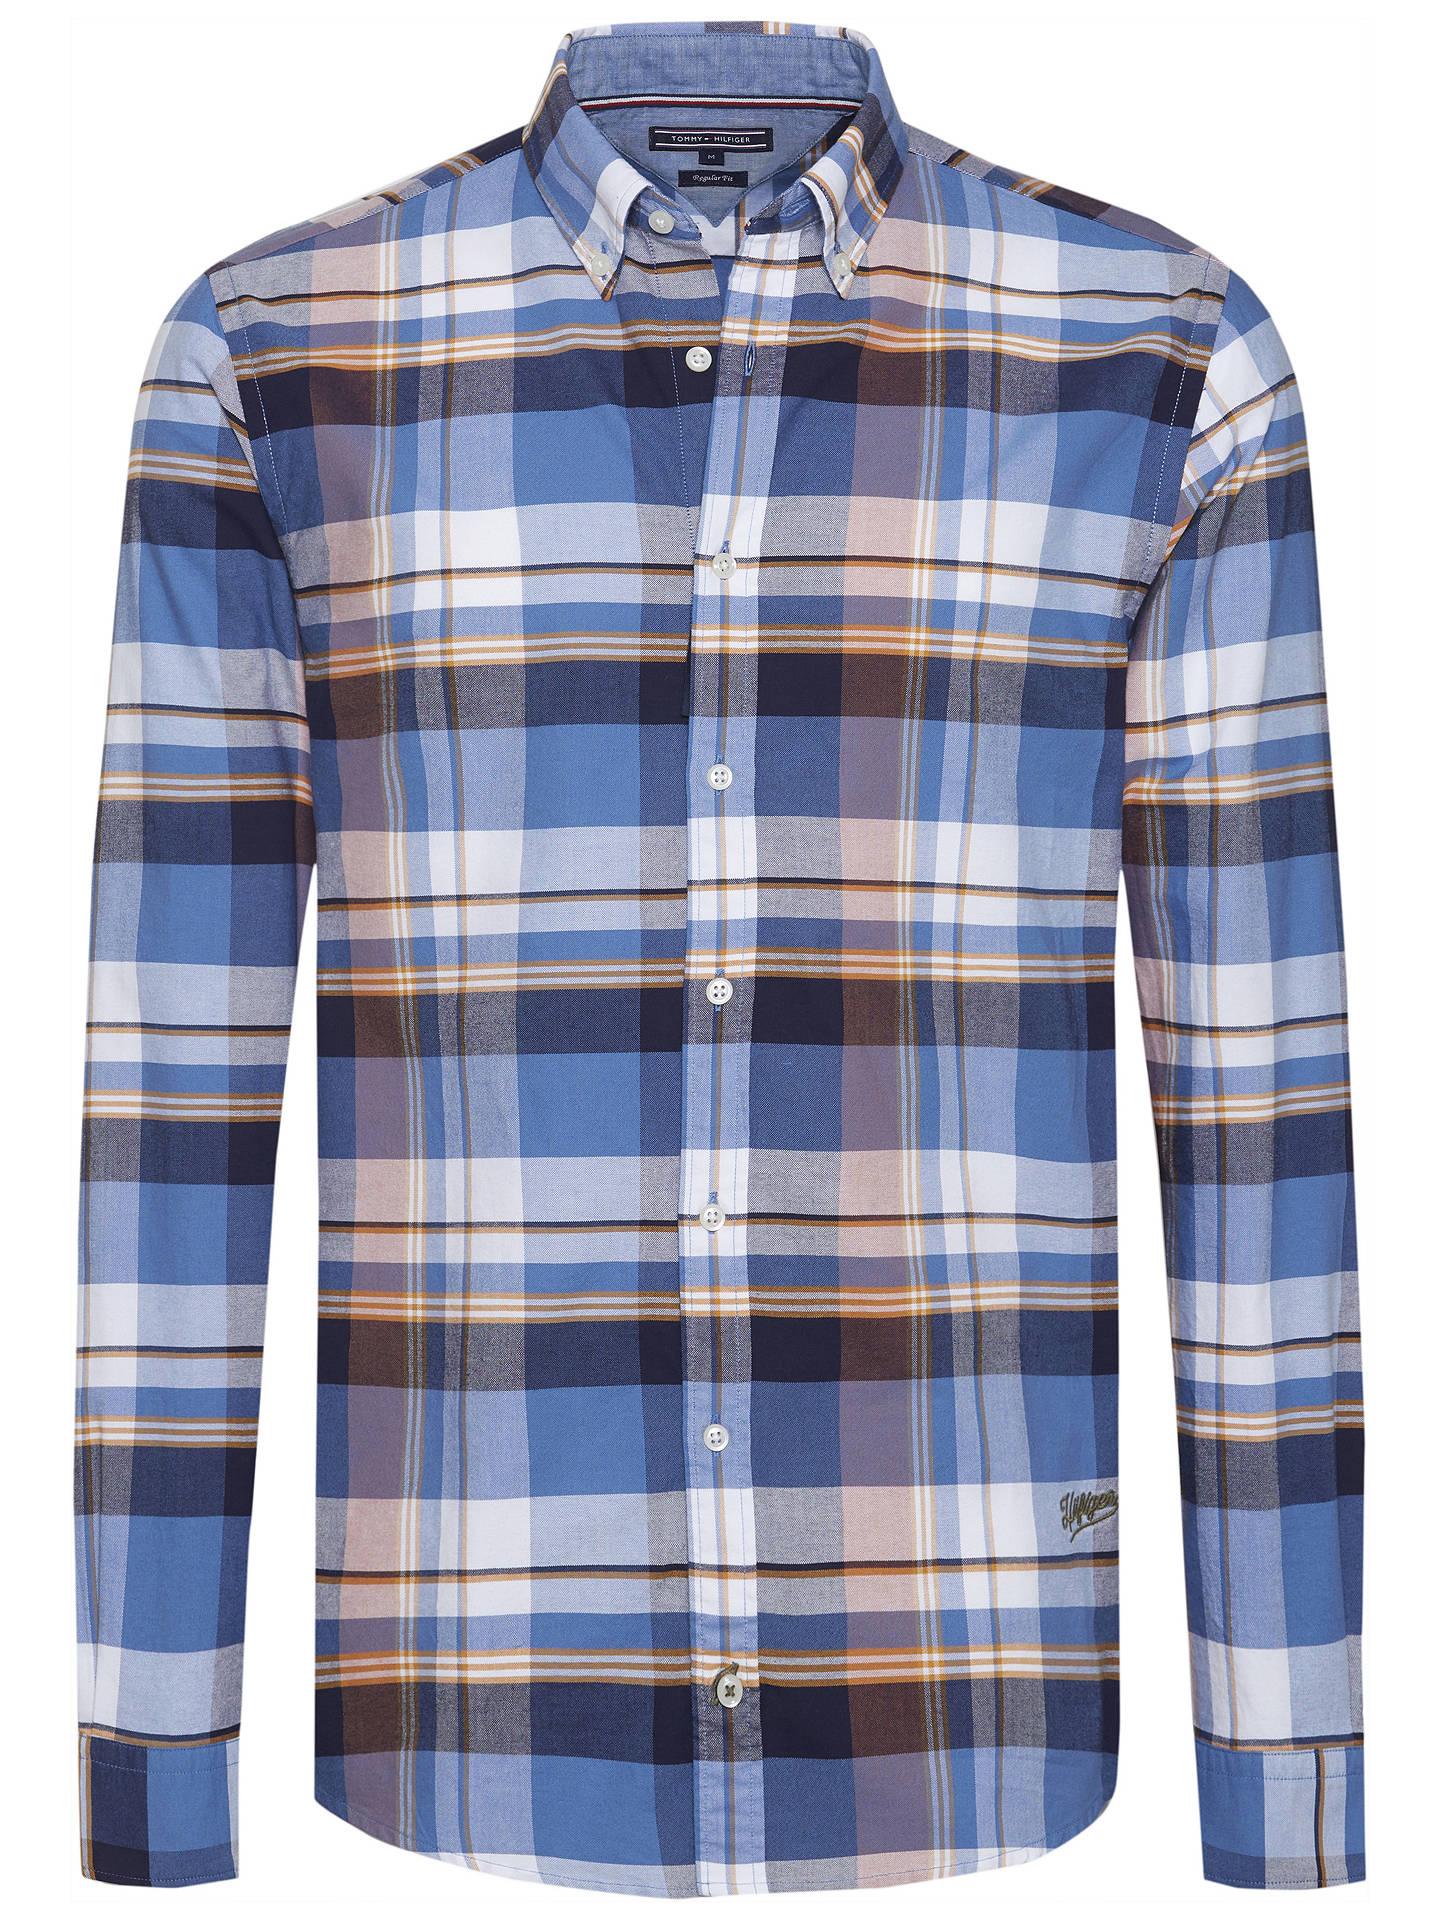 Tommy Hilfiger Delightful Standard Fit Check Shirt, Dutch